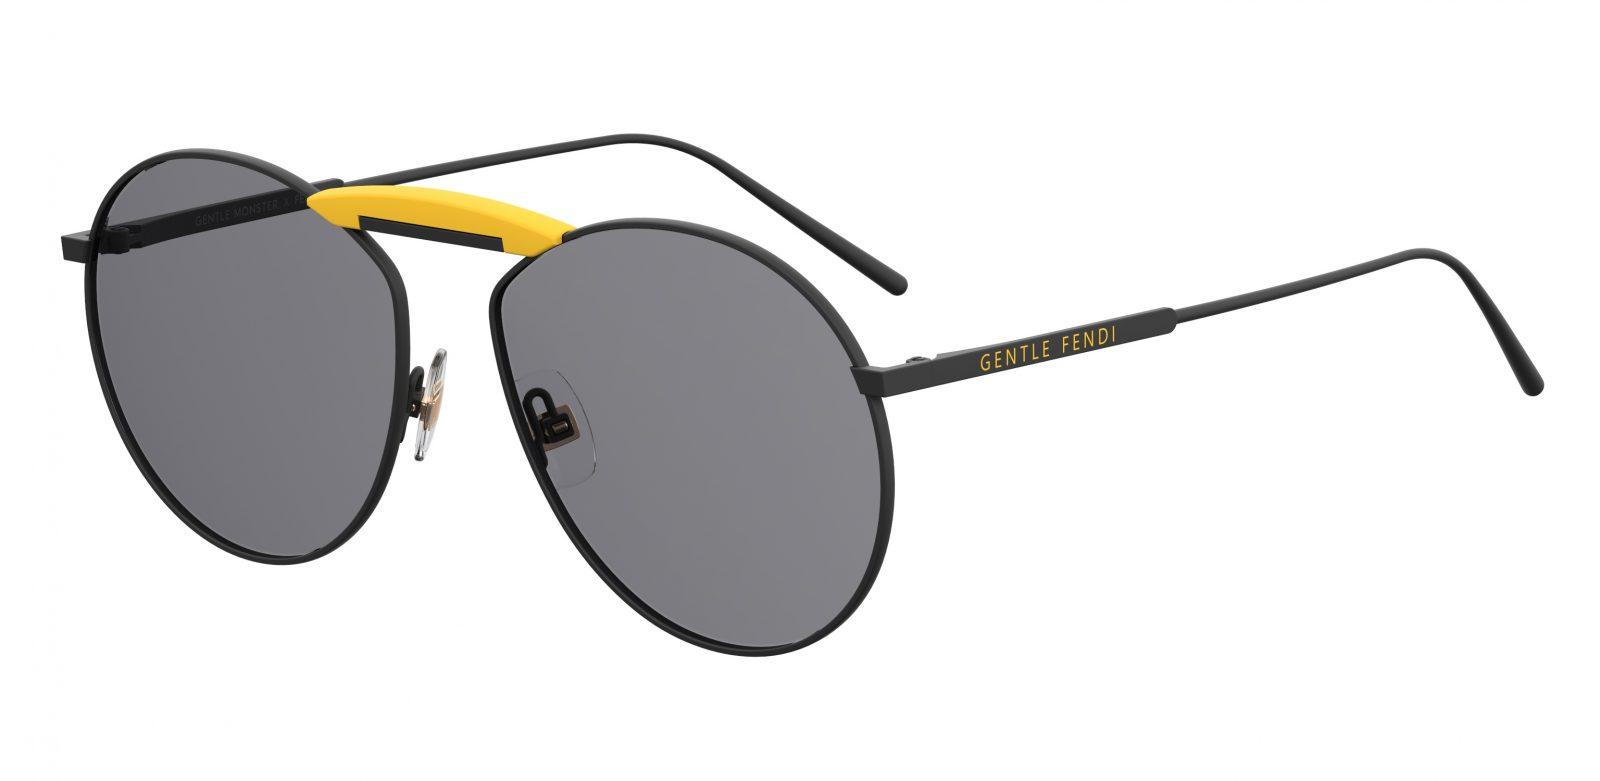 29a6b73fe1 Fendi Aviator Sunglasses Orange